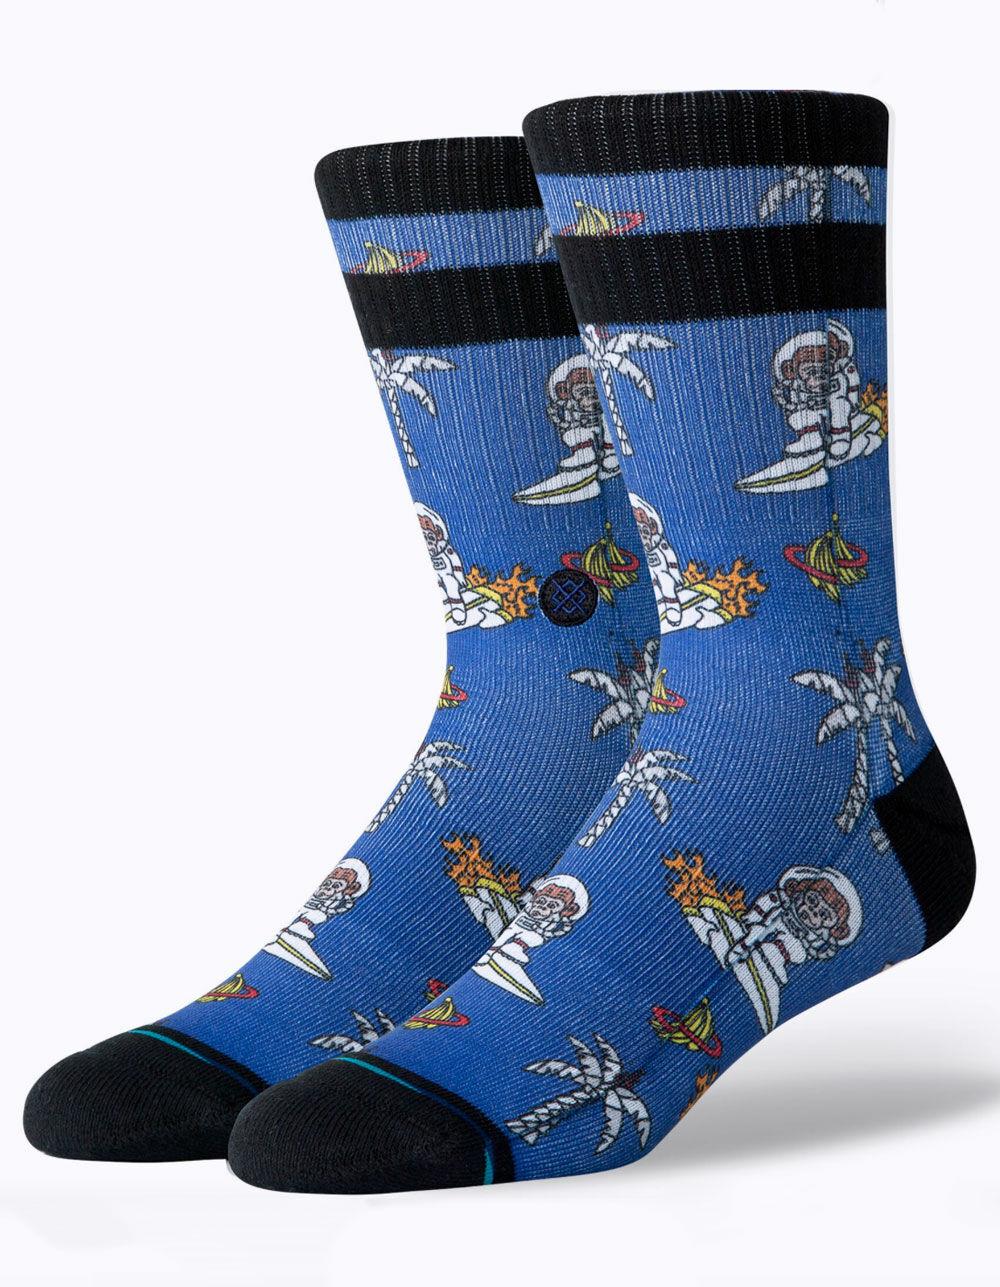 STANCE Space Monkey Crew Socks